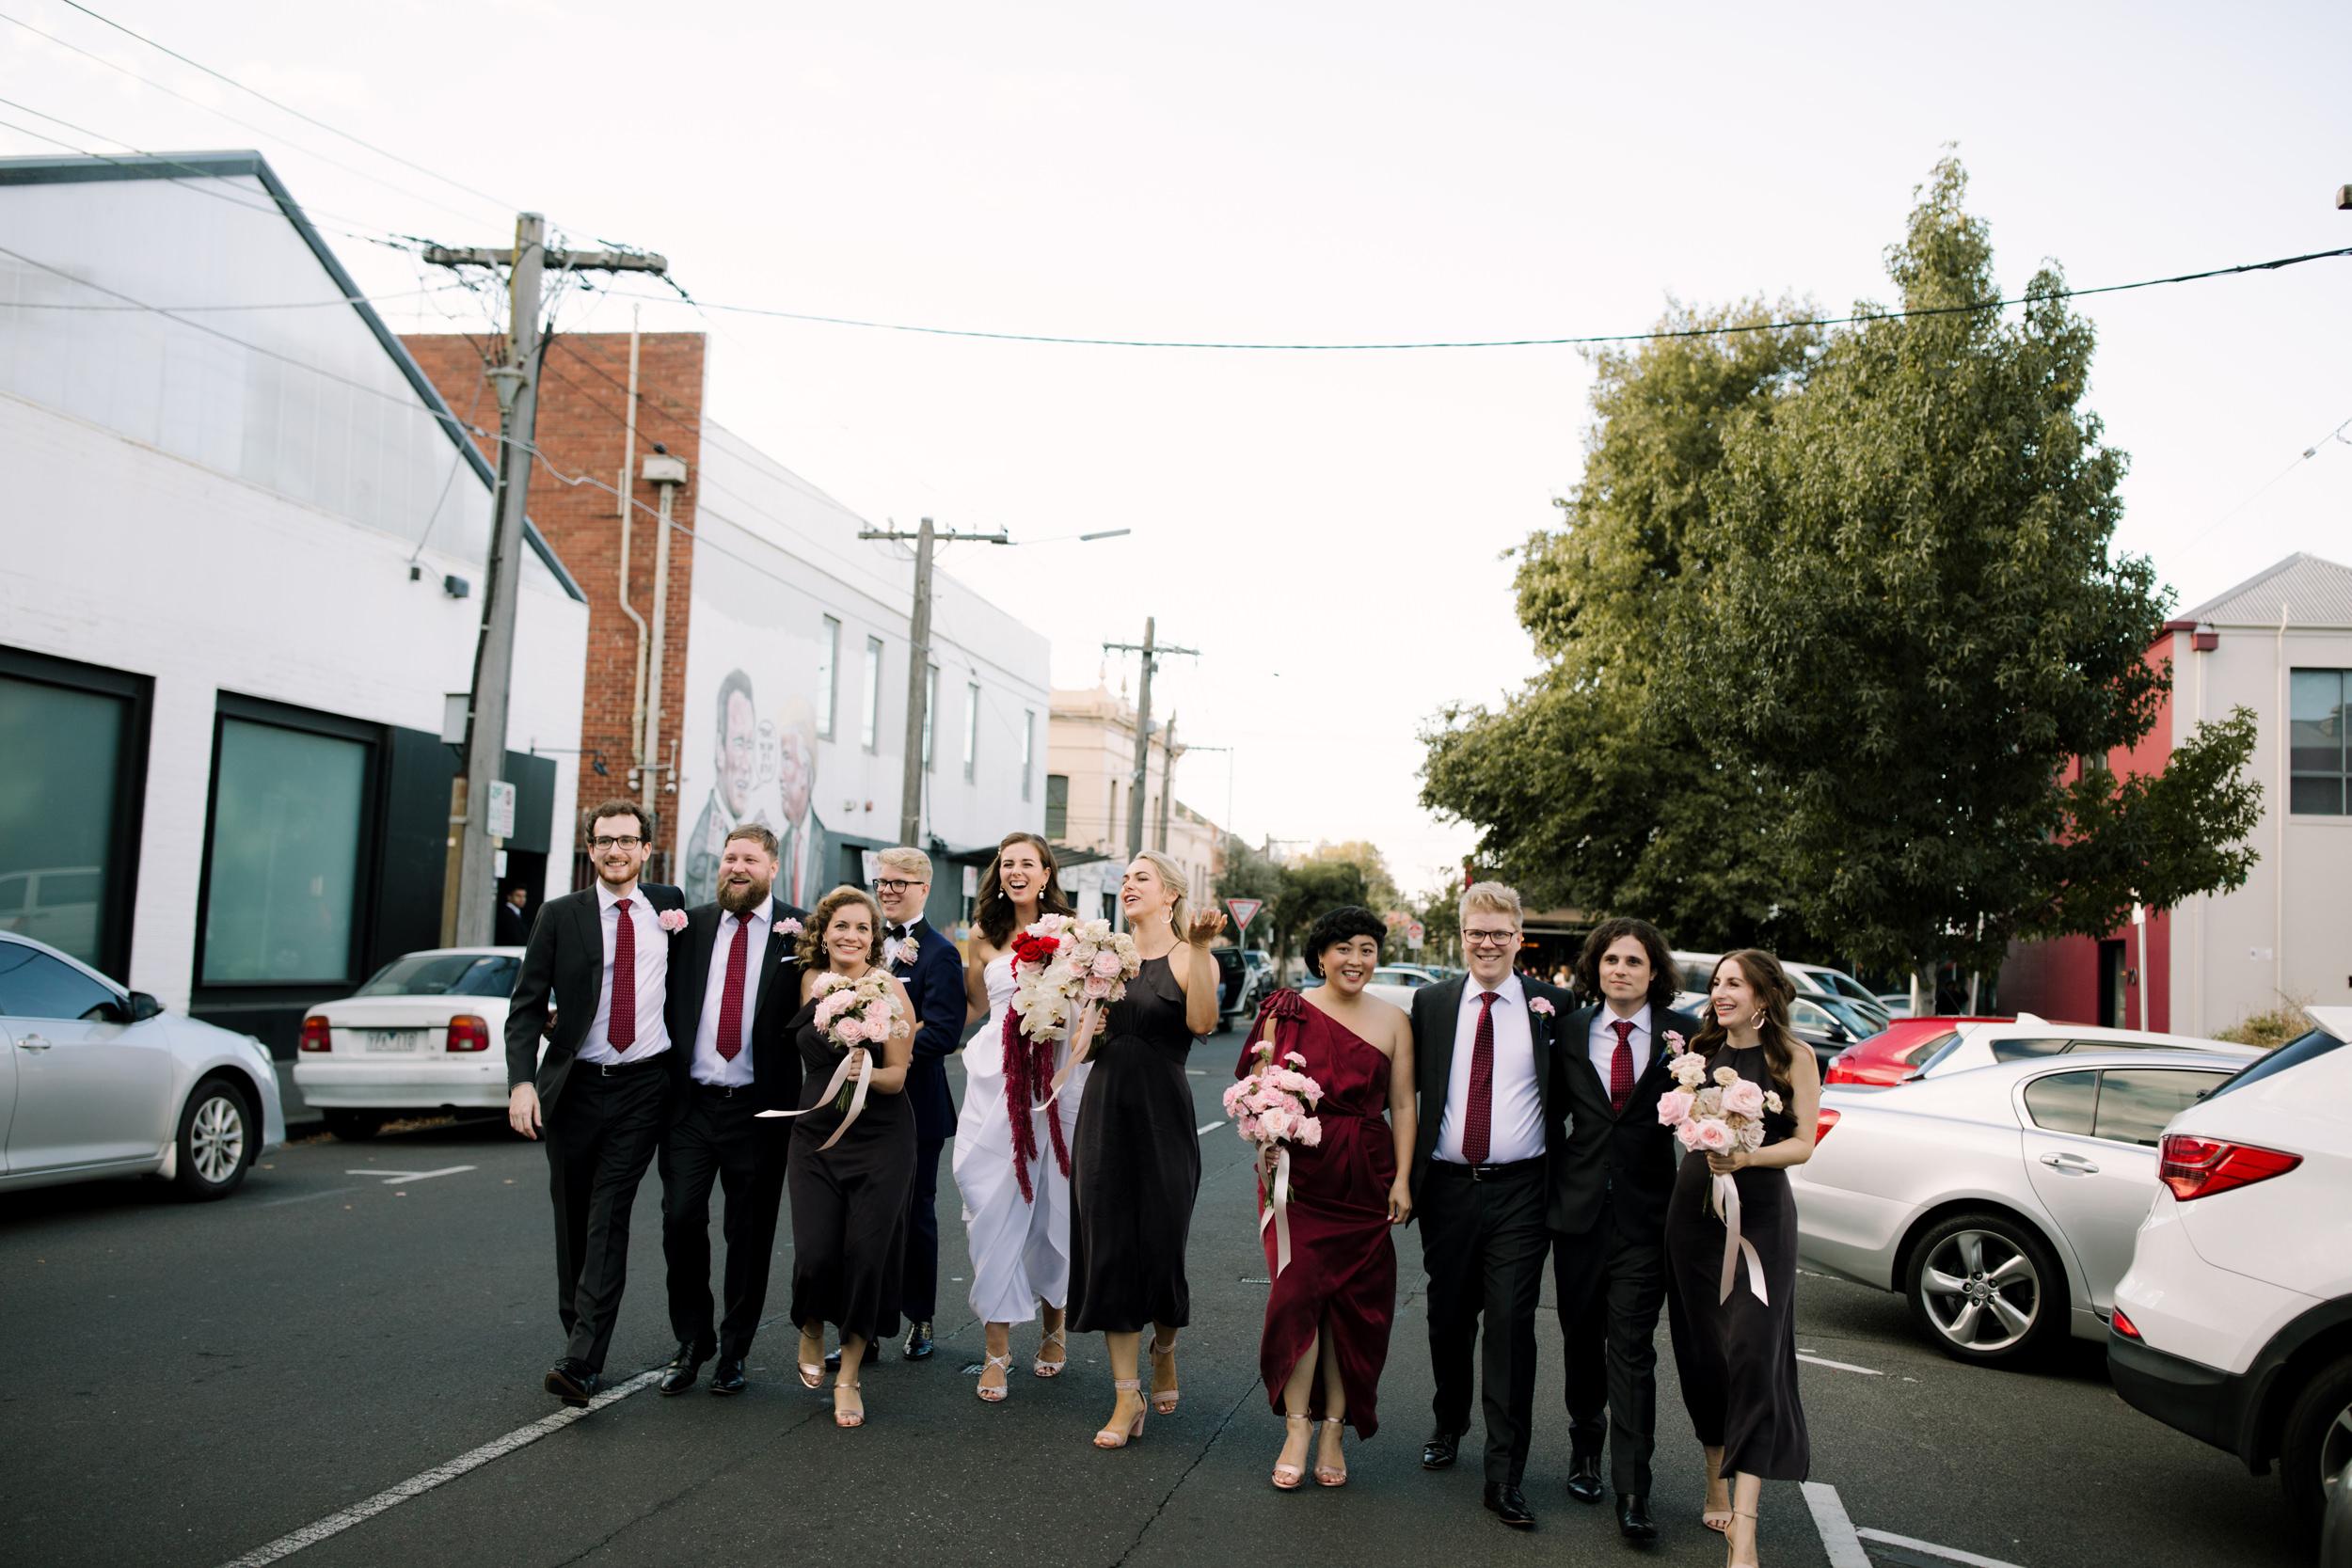 I-Got-You-Babe-Weddings-Tahlia&Mitch-Butler-Lane-Wedding0155.JPG